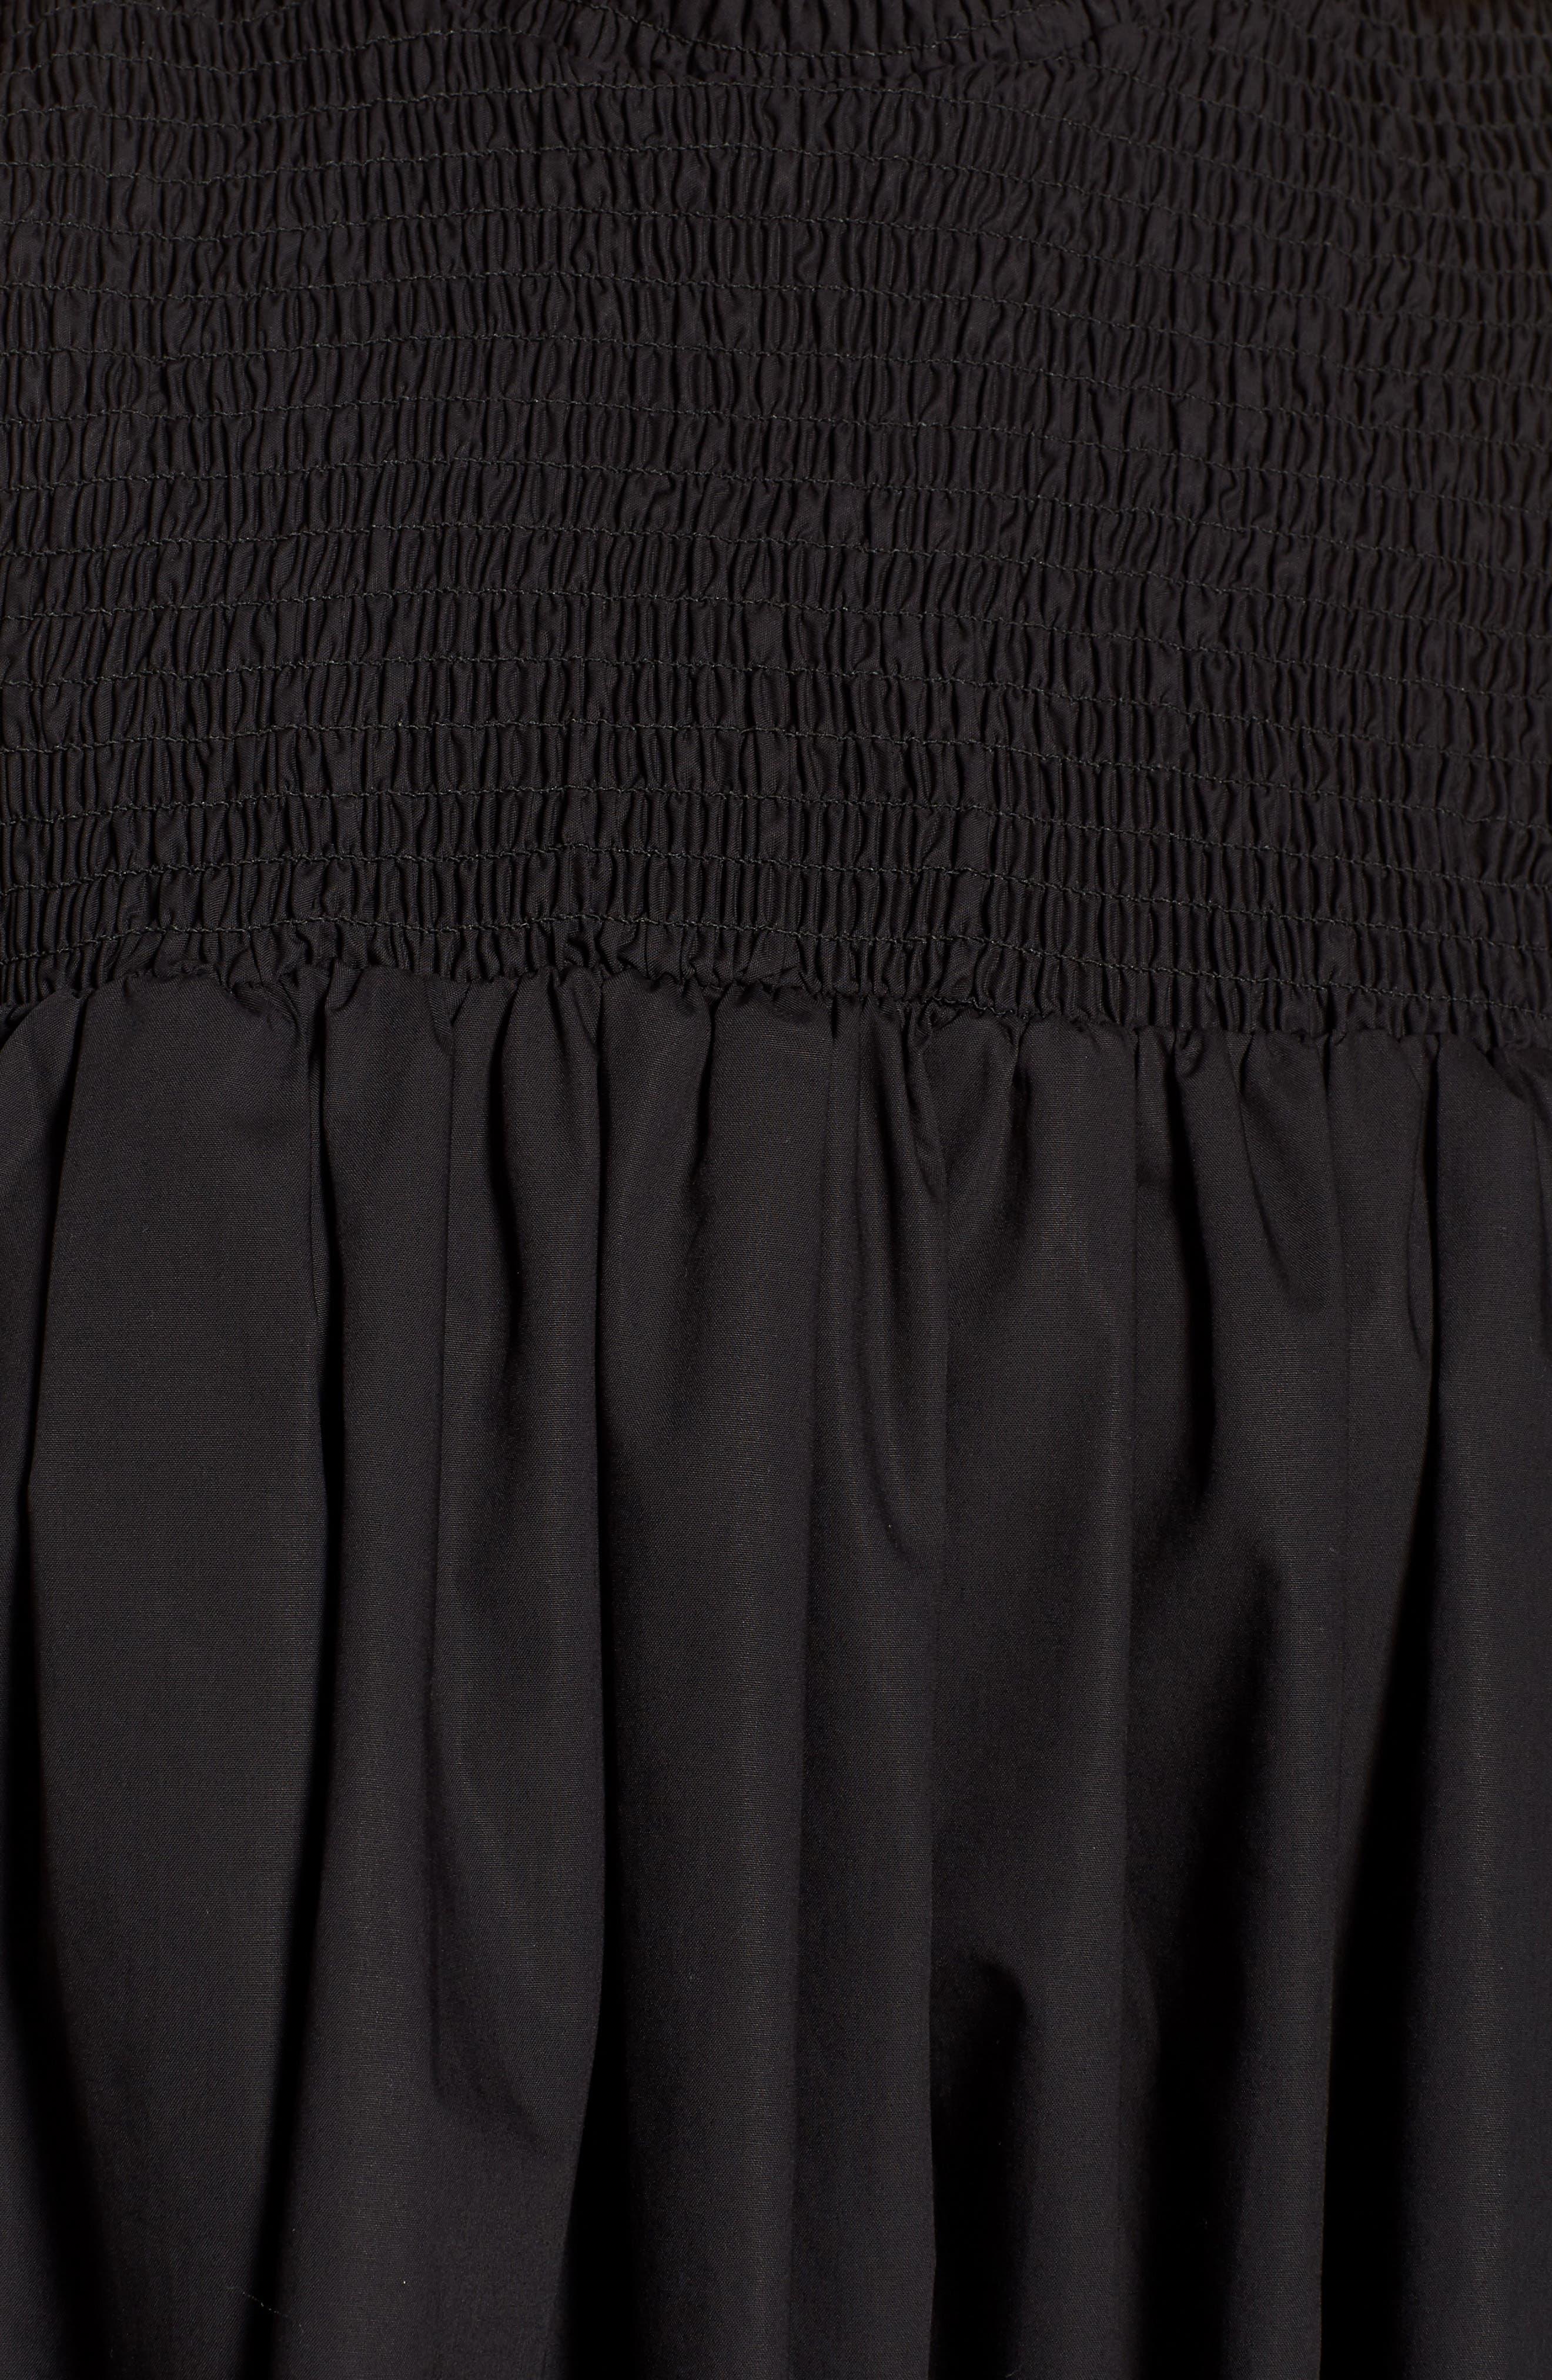 Ivy Cold Shoulder Dress,                             Alternate thumbnail 5, color,                             BLACK COTTON